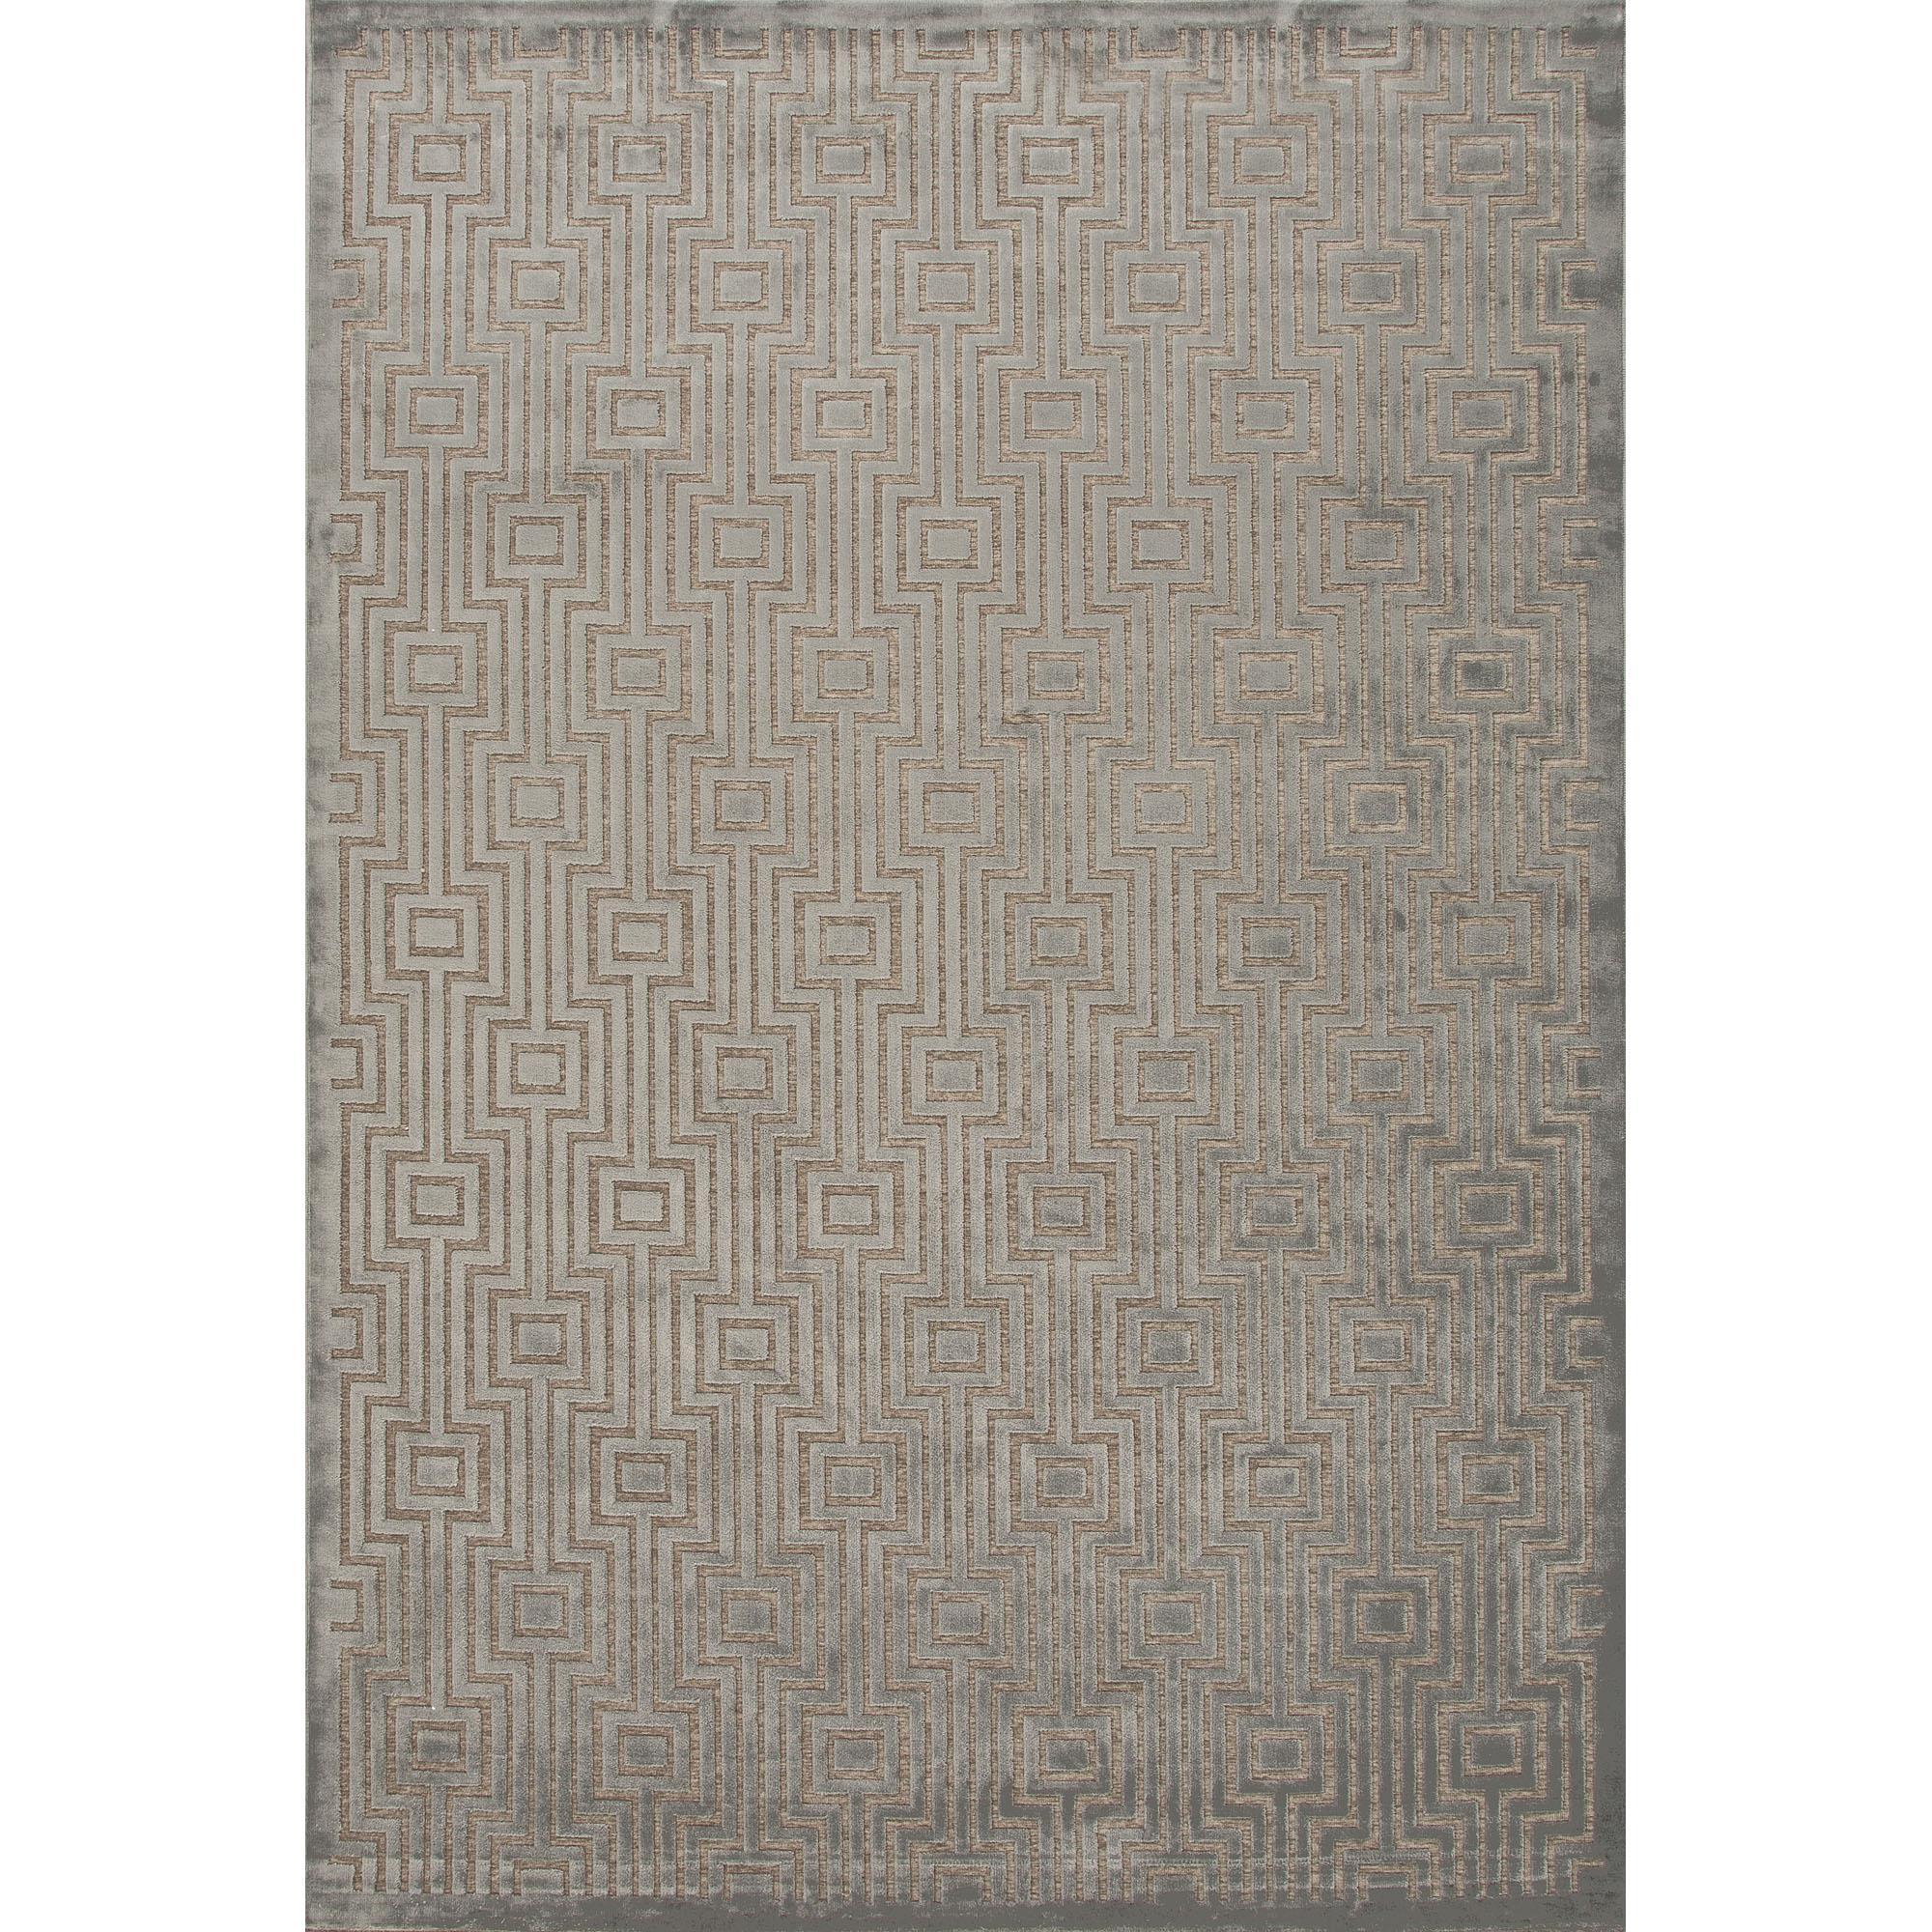 JAIPUR Rugs Fables 5 x 7.6 Rug - Item Number: RUG108649